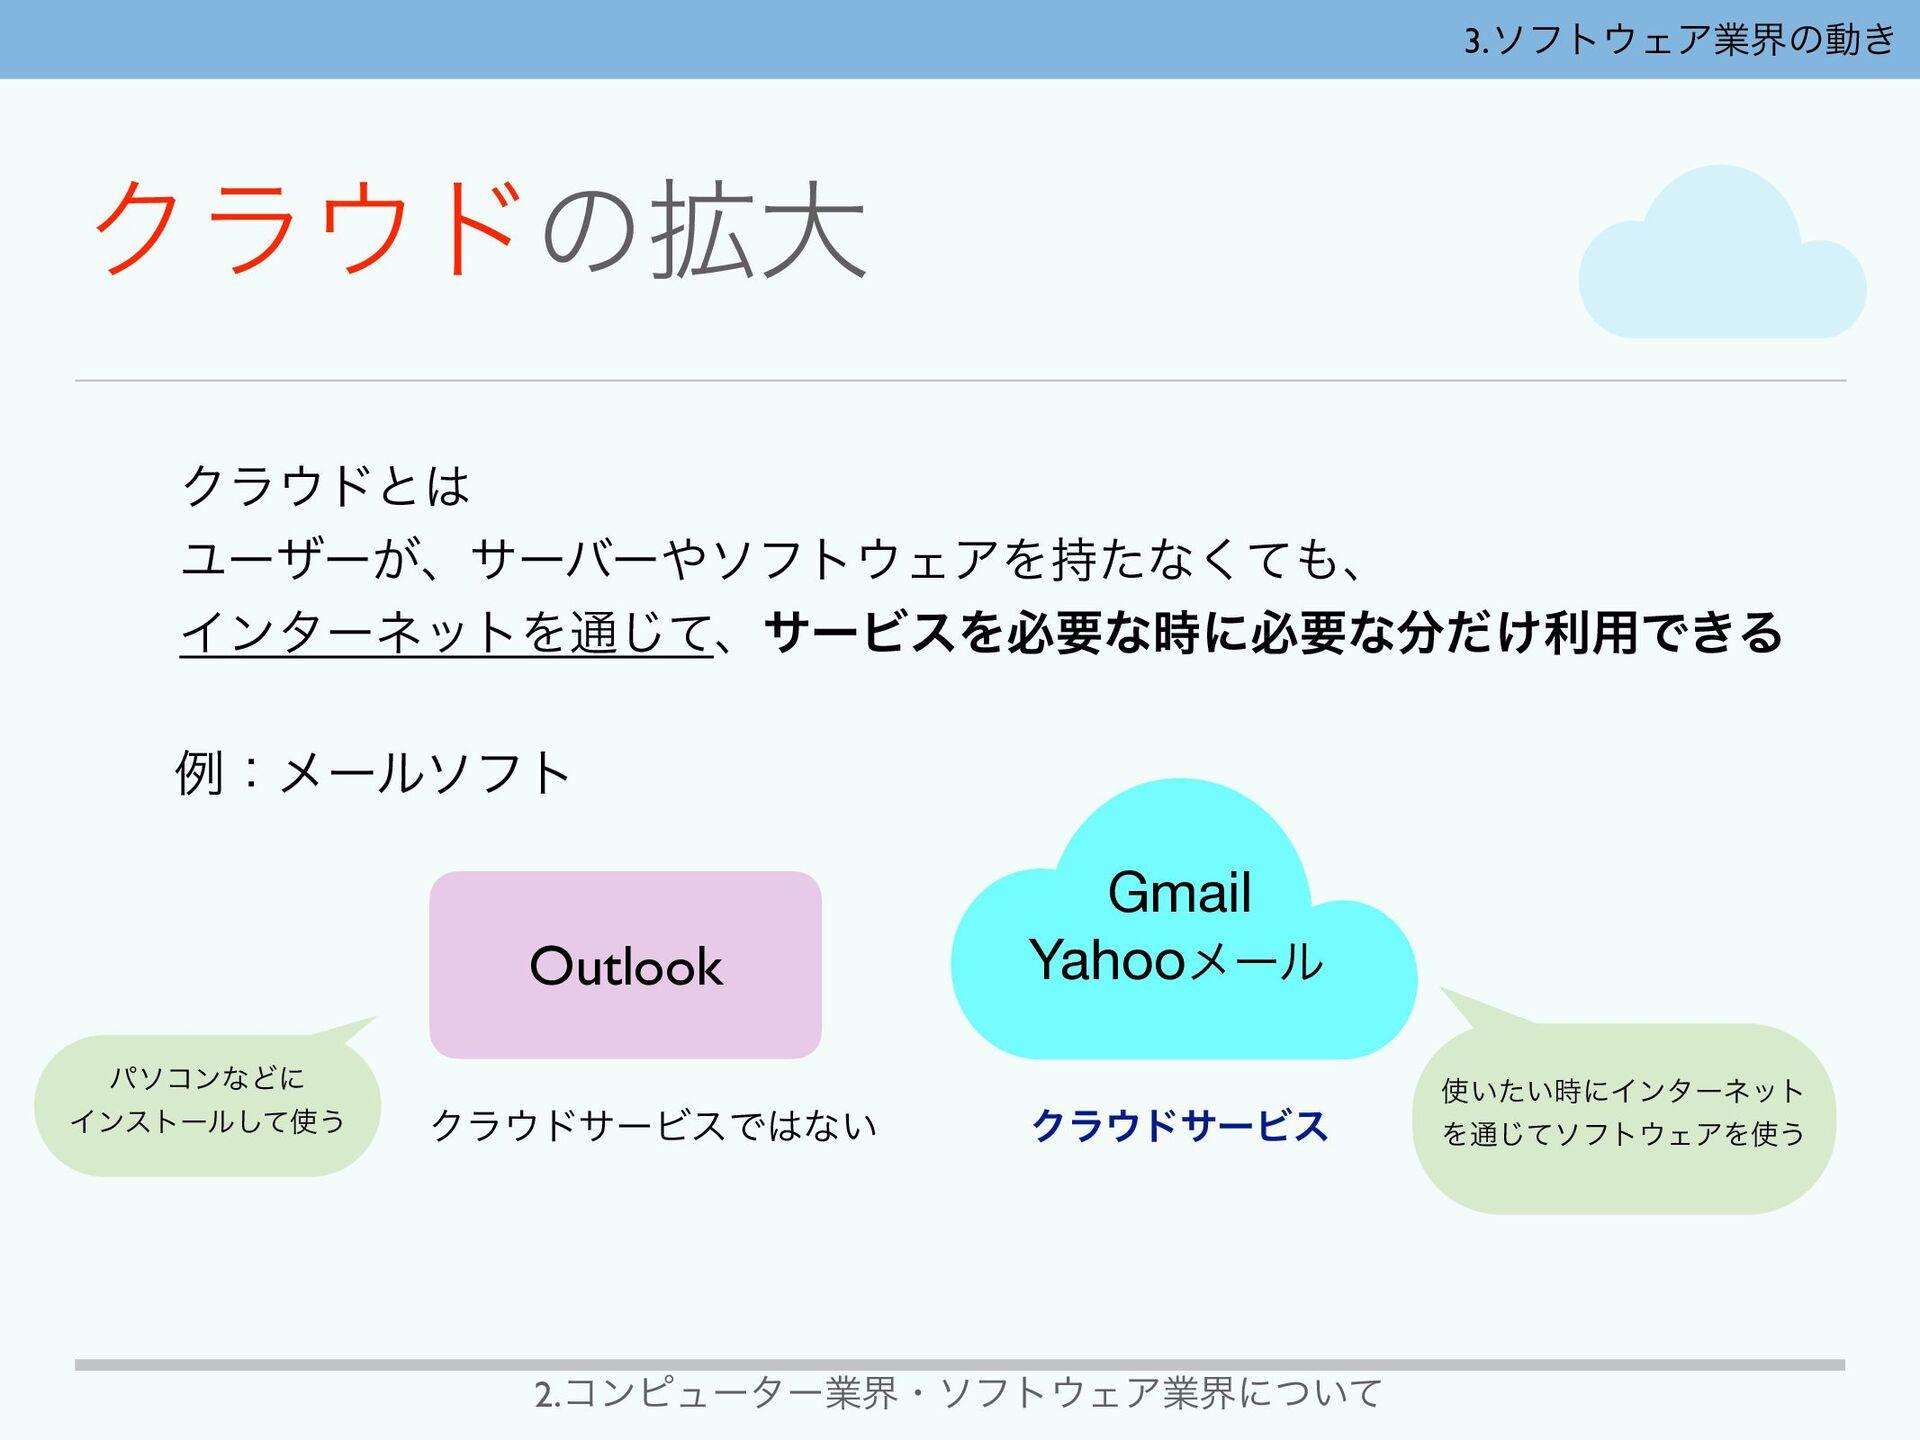 2.ίϯϐϡʔλʔۀքɾιϑτΣΞۀքʹ͍ͭͯ Outlook ΫϥυαʔϏεͰͳ͍ Ϋ...